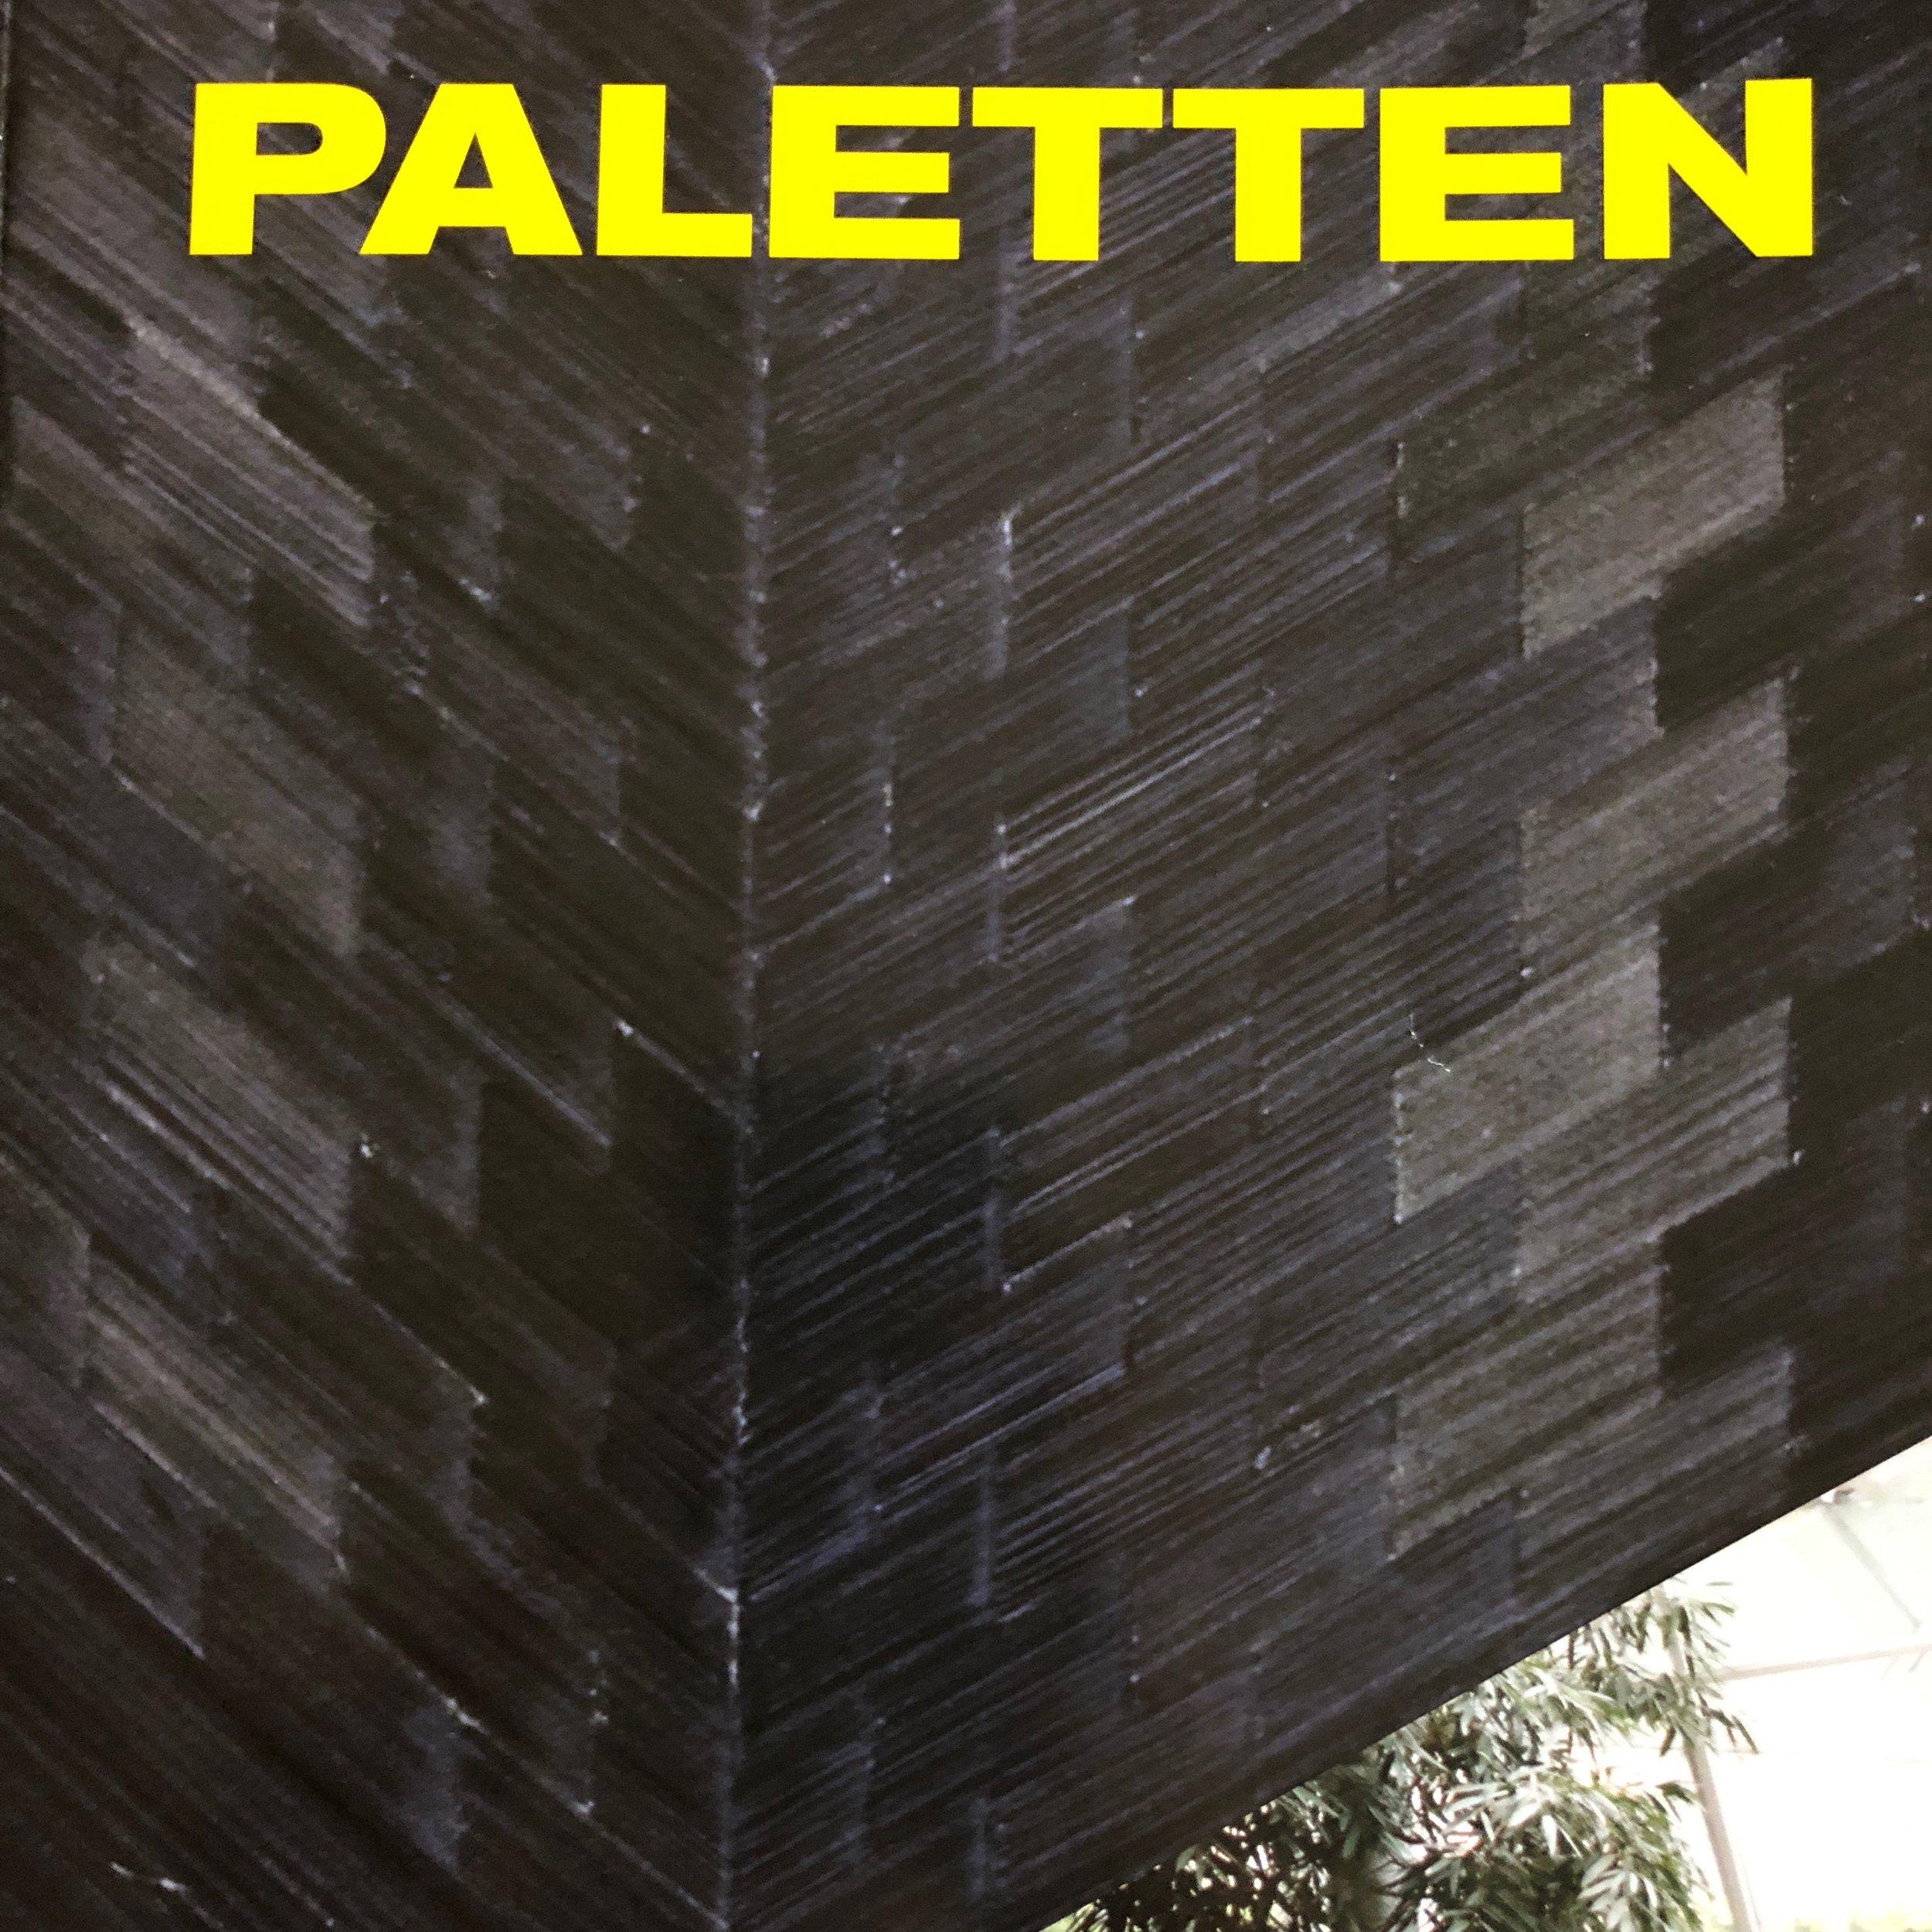 paletten.JPG